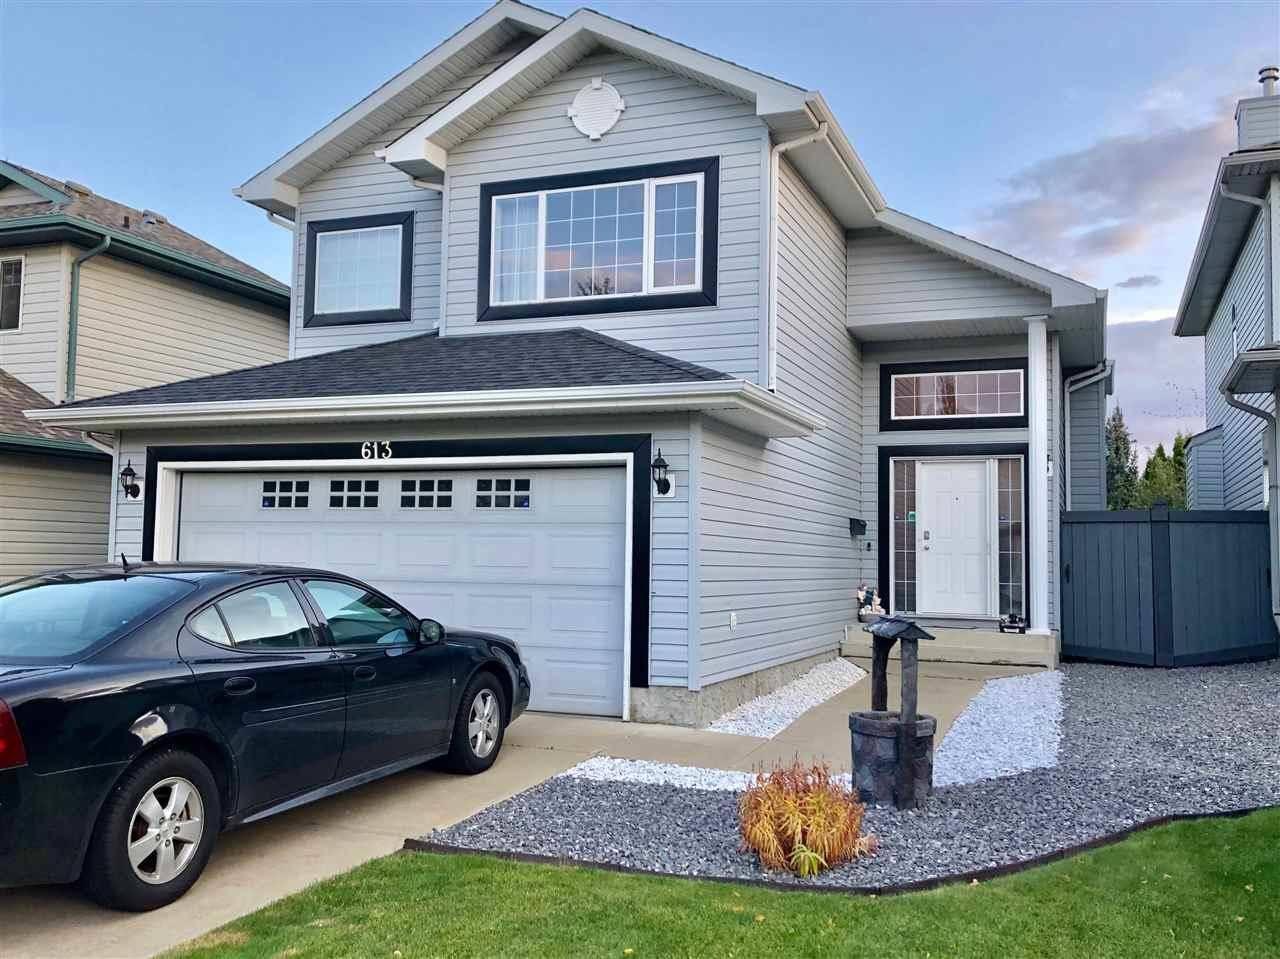 House for sale at 613 Beck Cs Sw Edmonton Alberta - MLS: E4187664